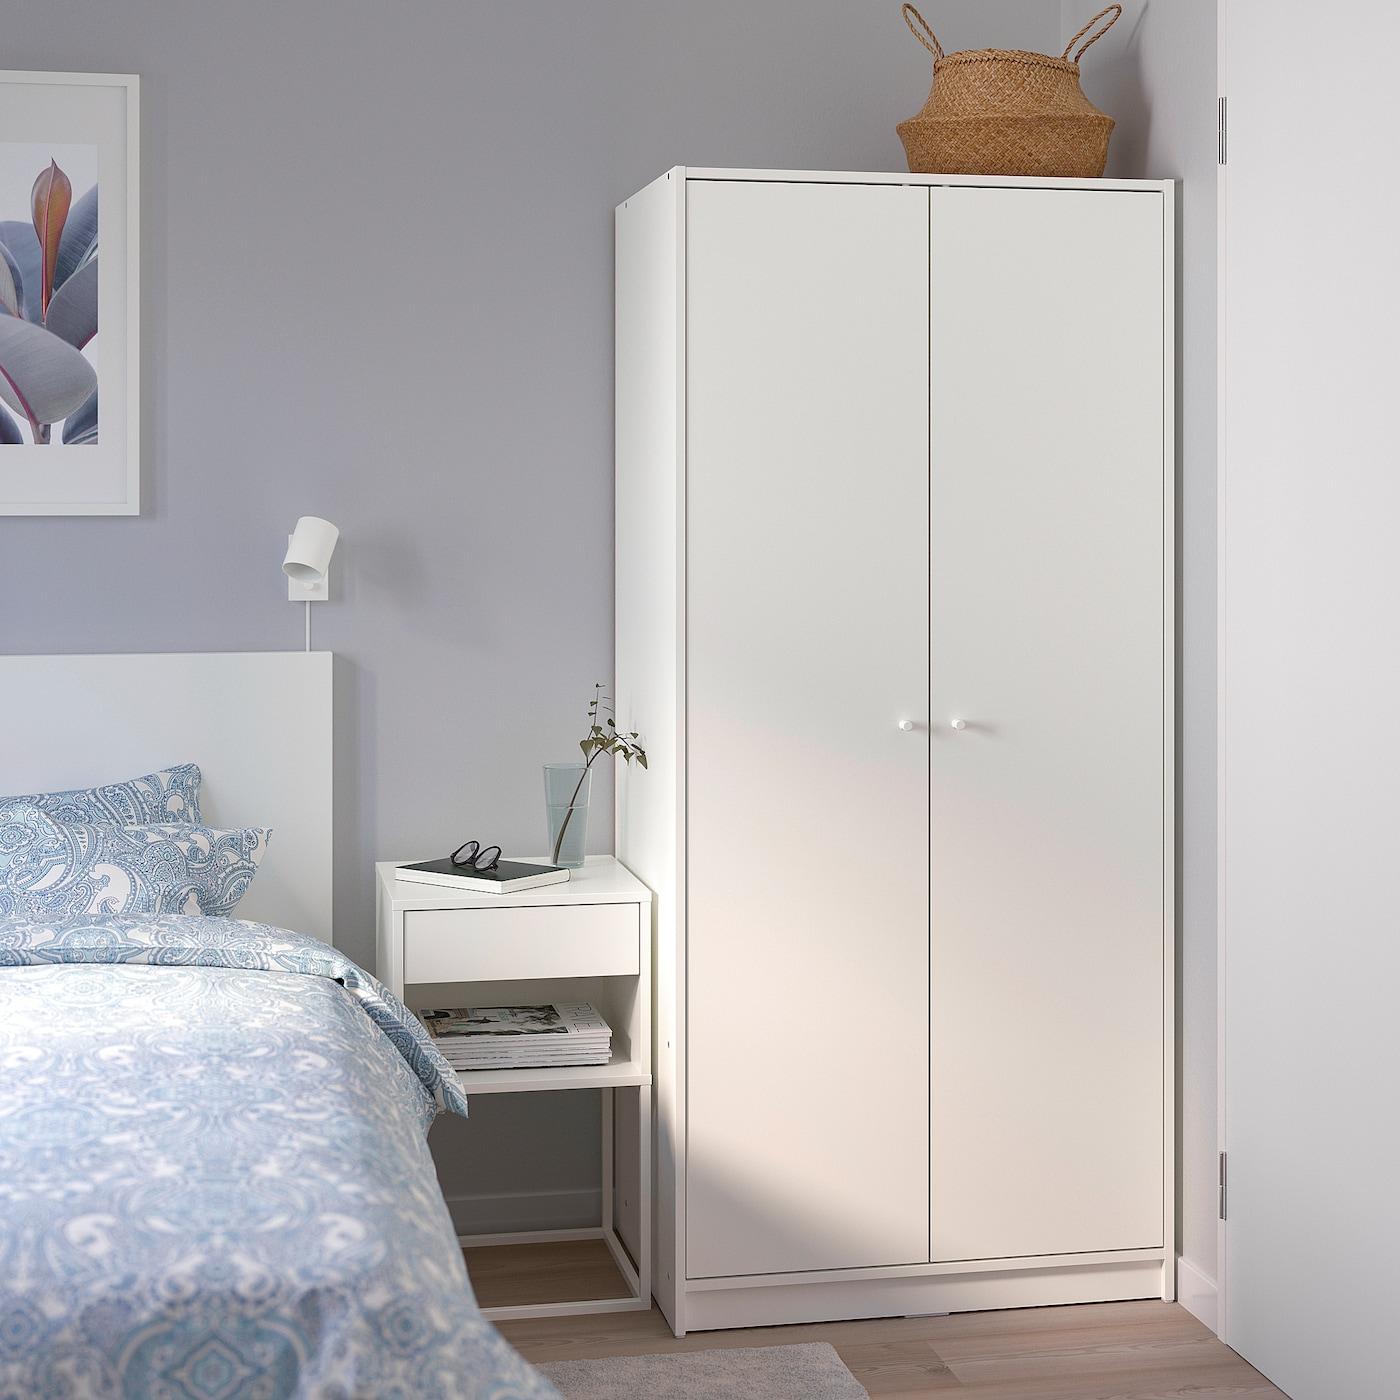 Kleppstad Guardaroba Con 2 Ante Bianco Ikea It